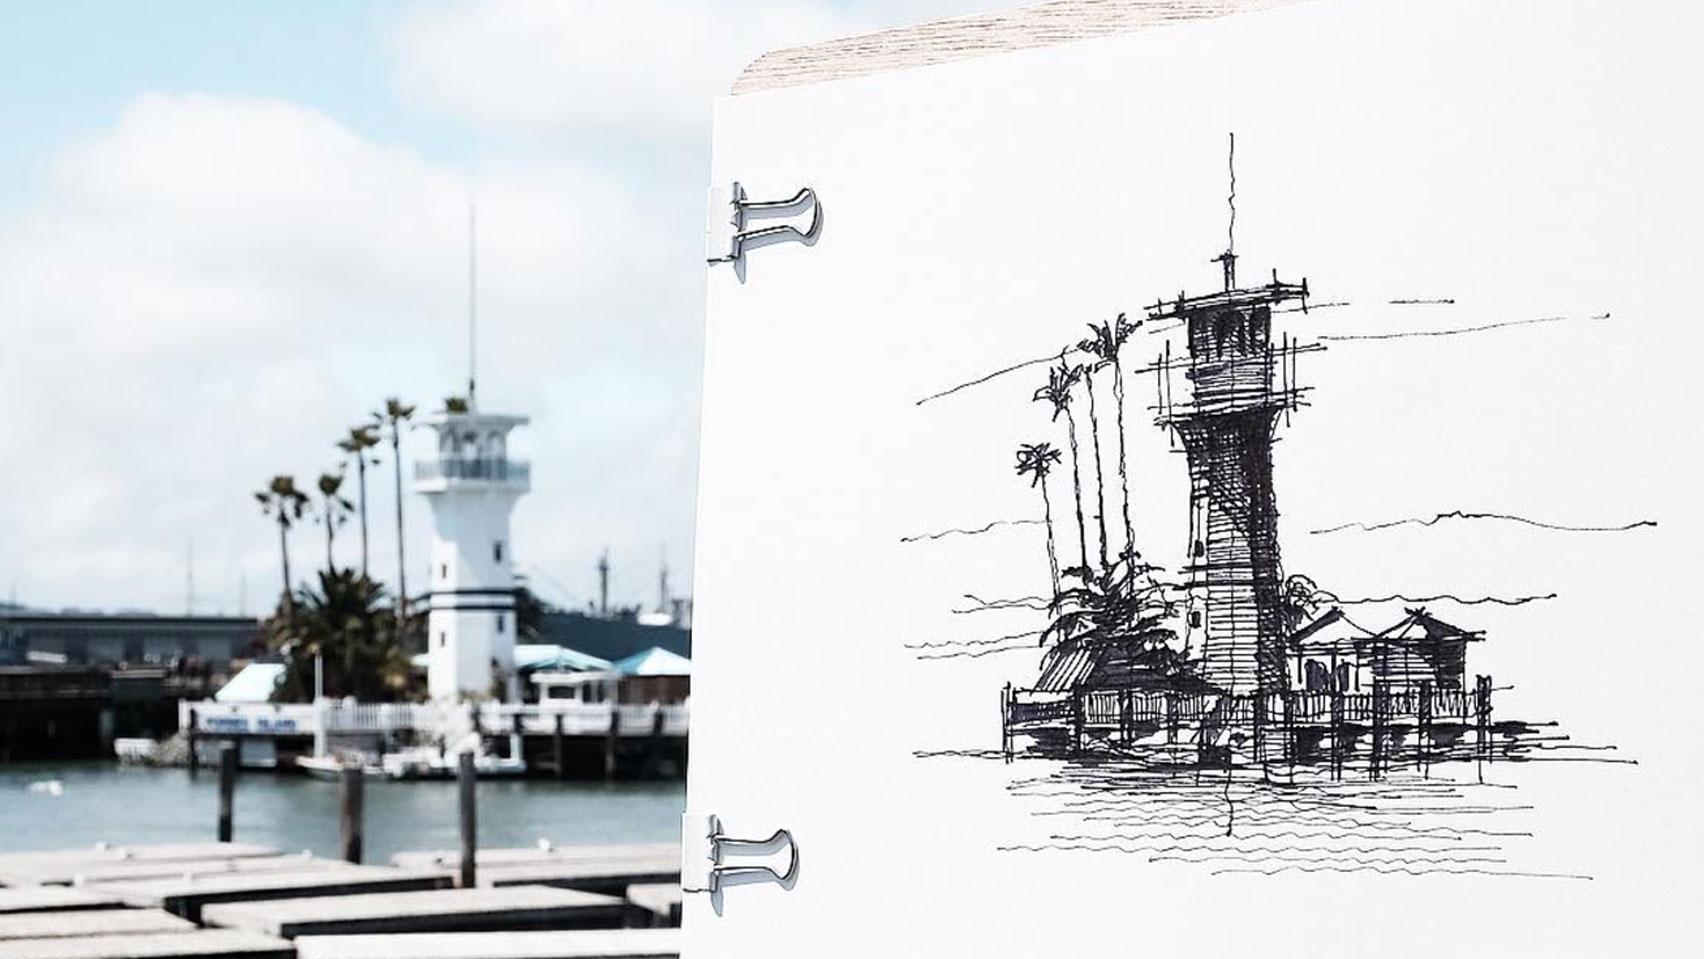 Dan Hogman's architectural sketches